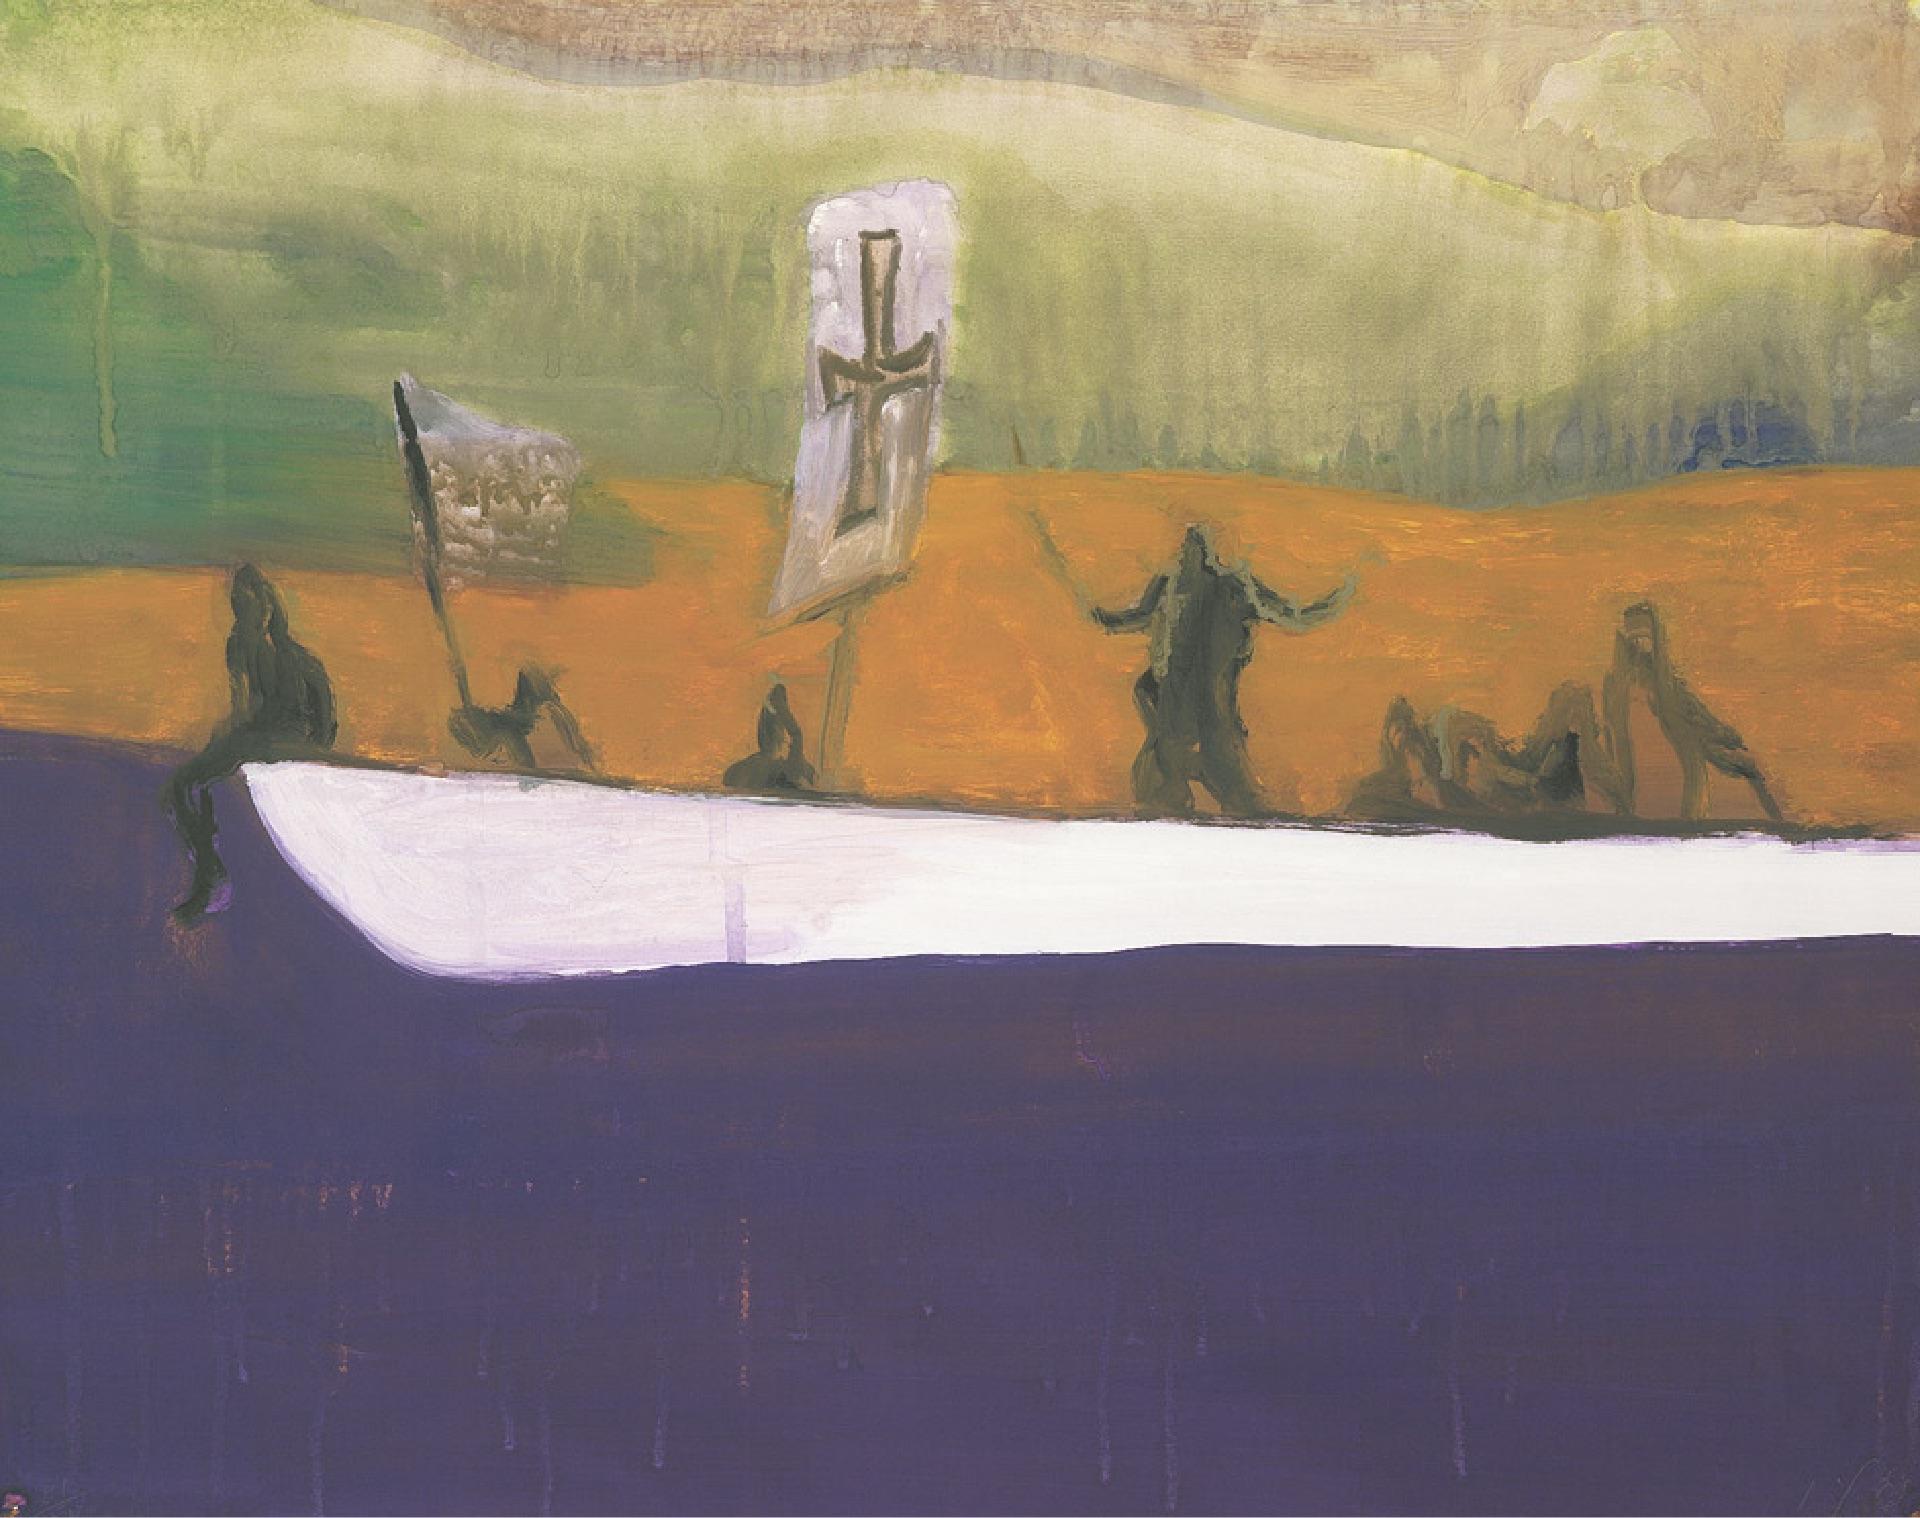 Kunstwerk Untitled ( Canoe ) des Künstlers Peter Doig kaufen